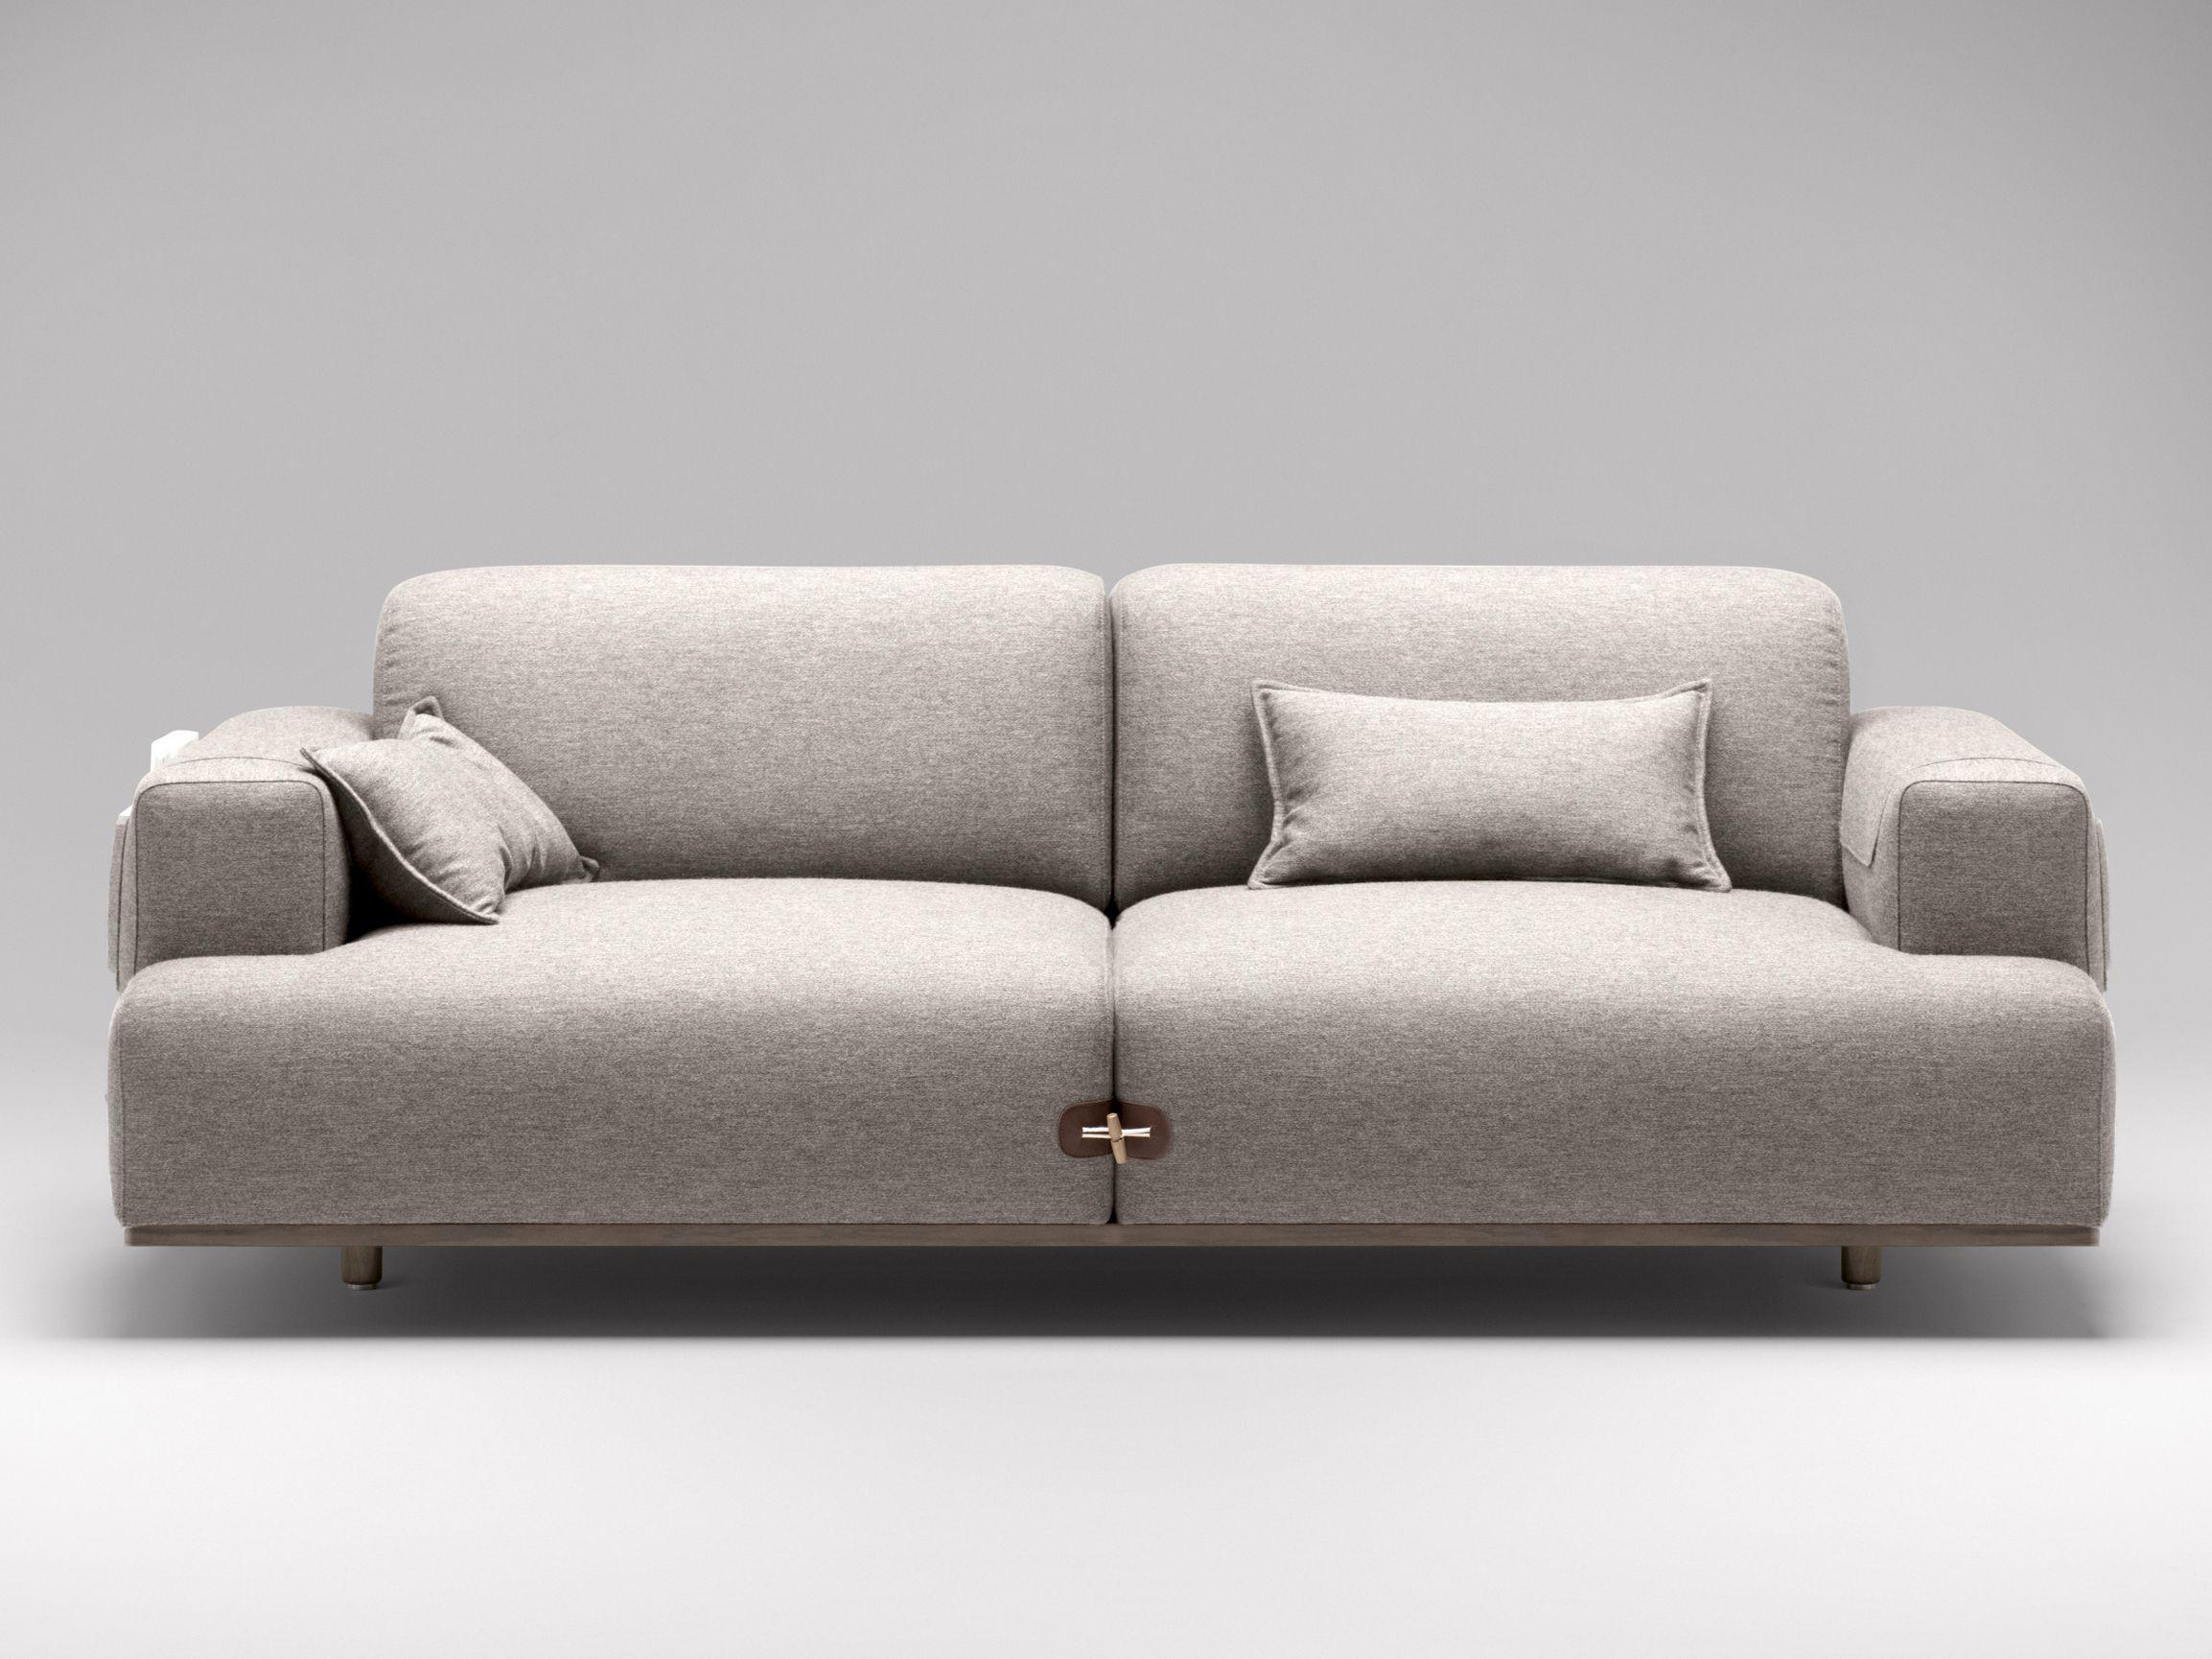 duffle 2 seater sofa by bosc design jean louis iratzoki. Black Bedroom Furniture Sets. Home Design Ideas